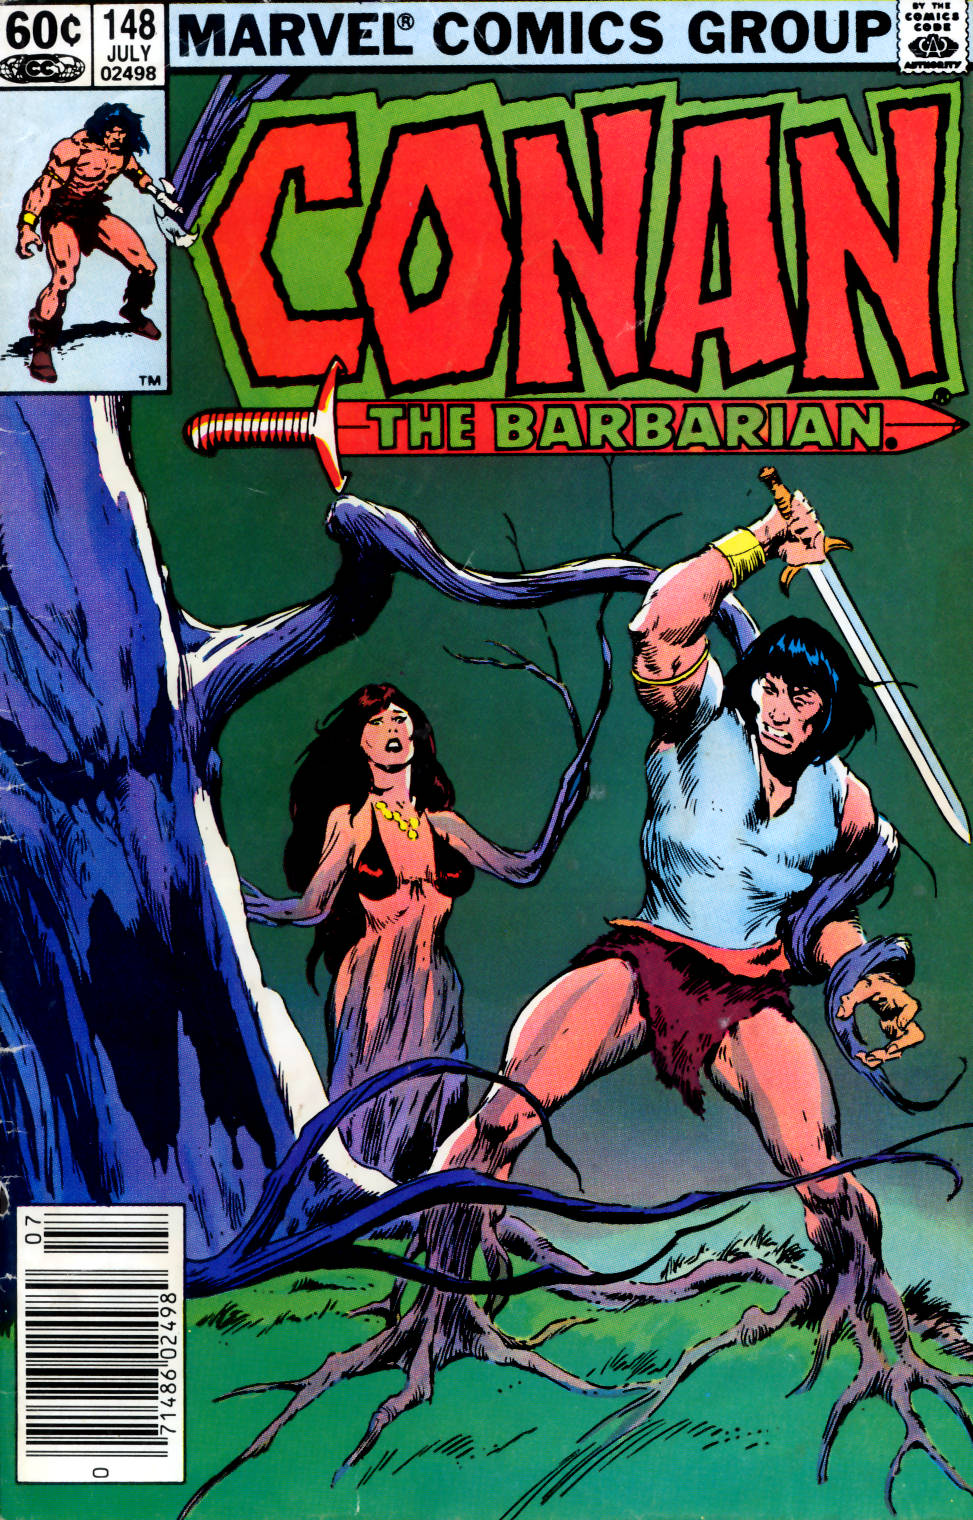 Conan the Barbarian (1970) Issue #148 #160 - English 1